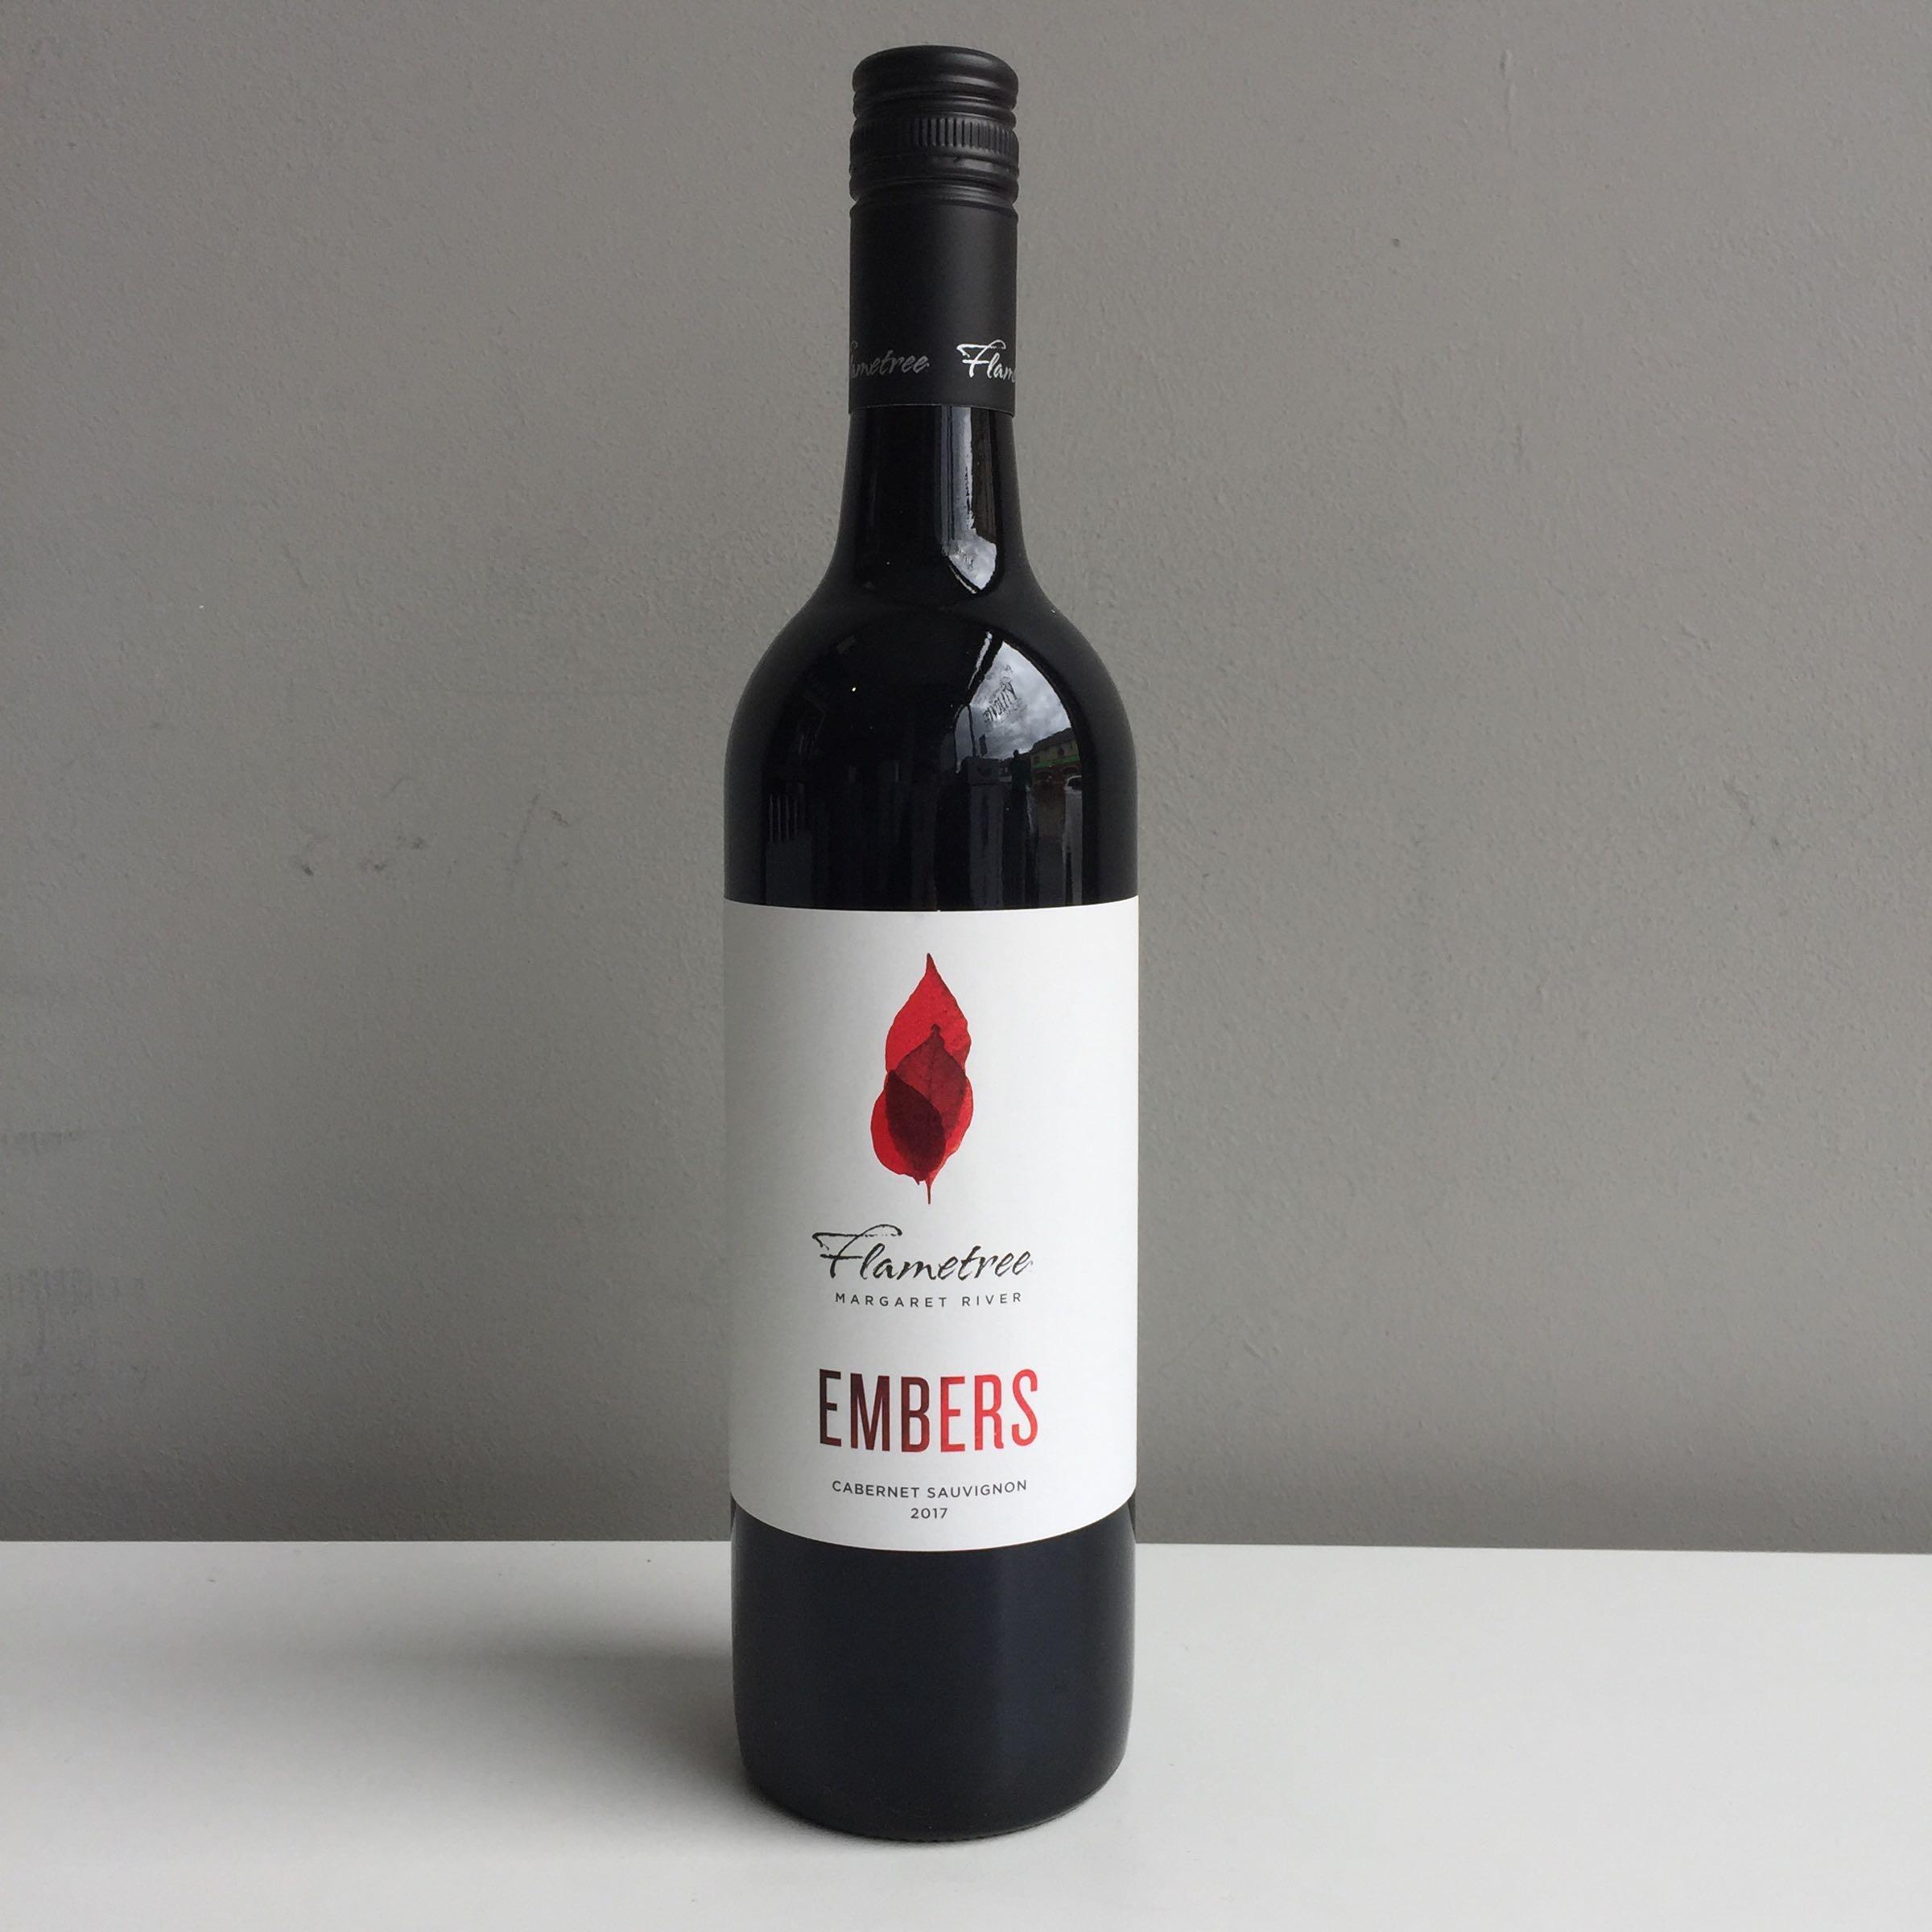 Flametree Embers - Cabernet Sauvignon